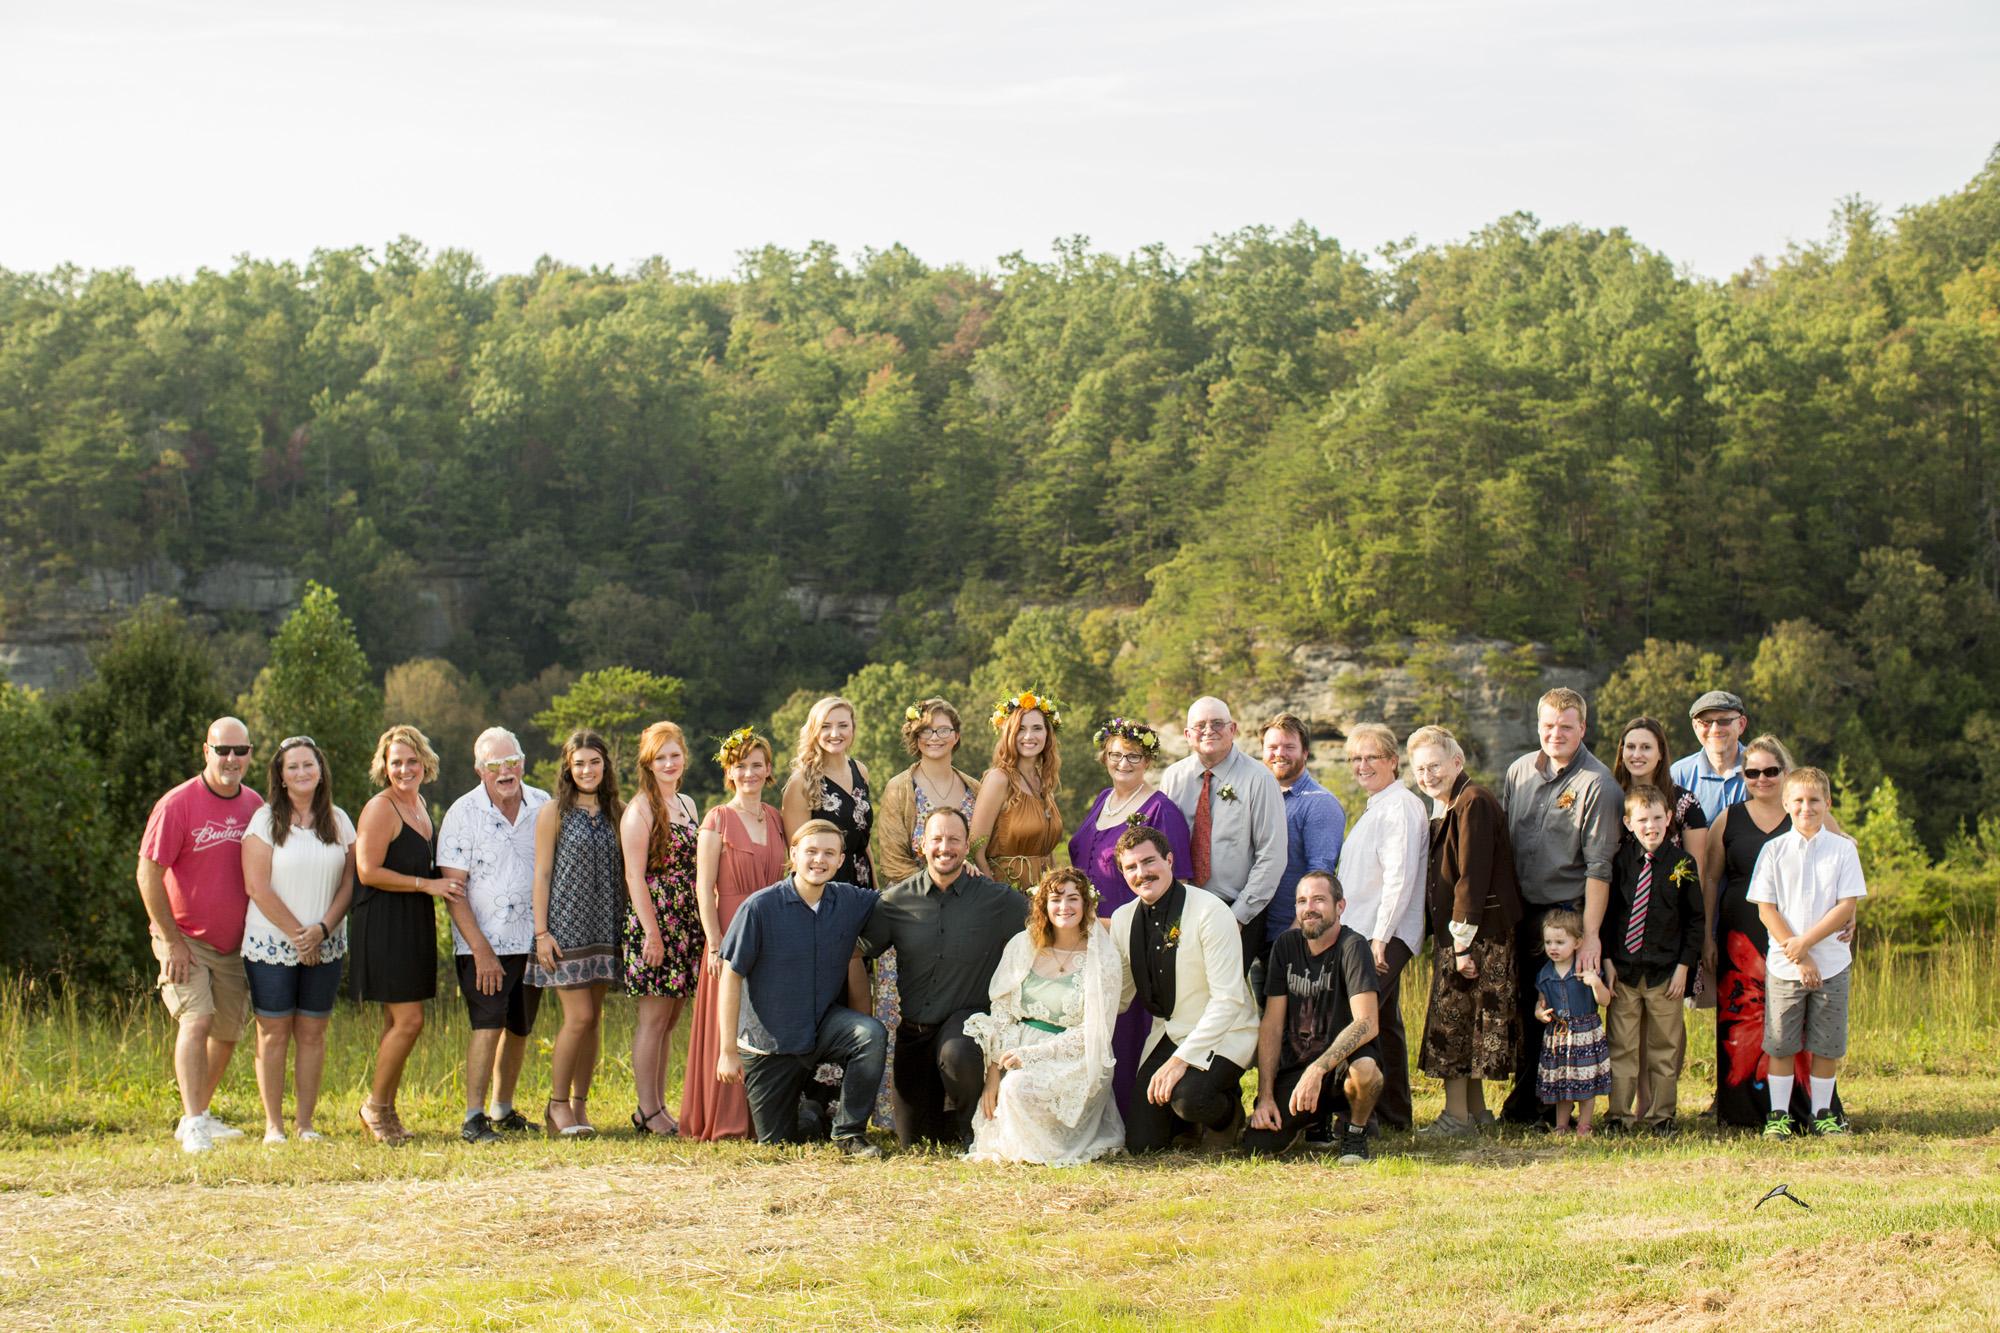 Seriously_Sabrina_Photography_Red_River_Gorge_Kentucky_Wedding_ShawnDana141.jpg